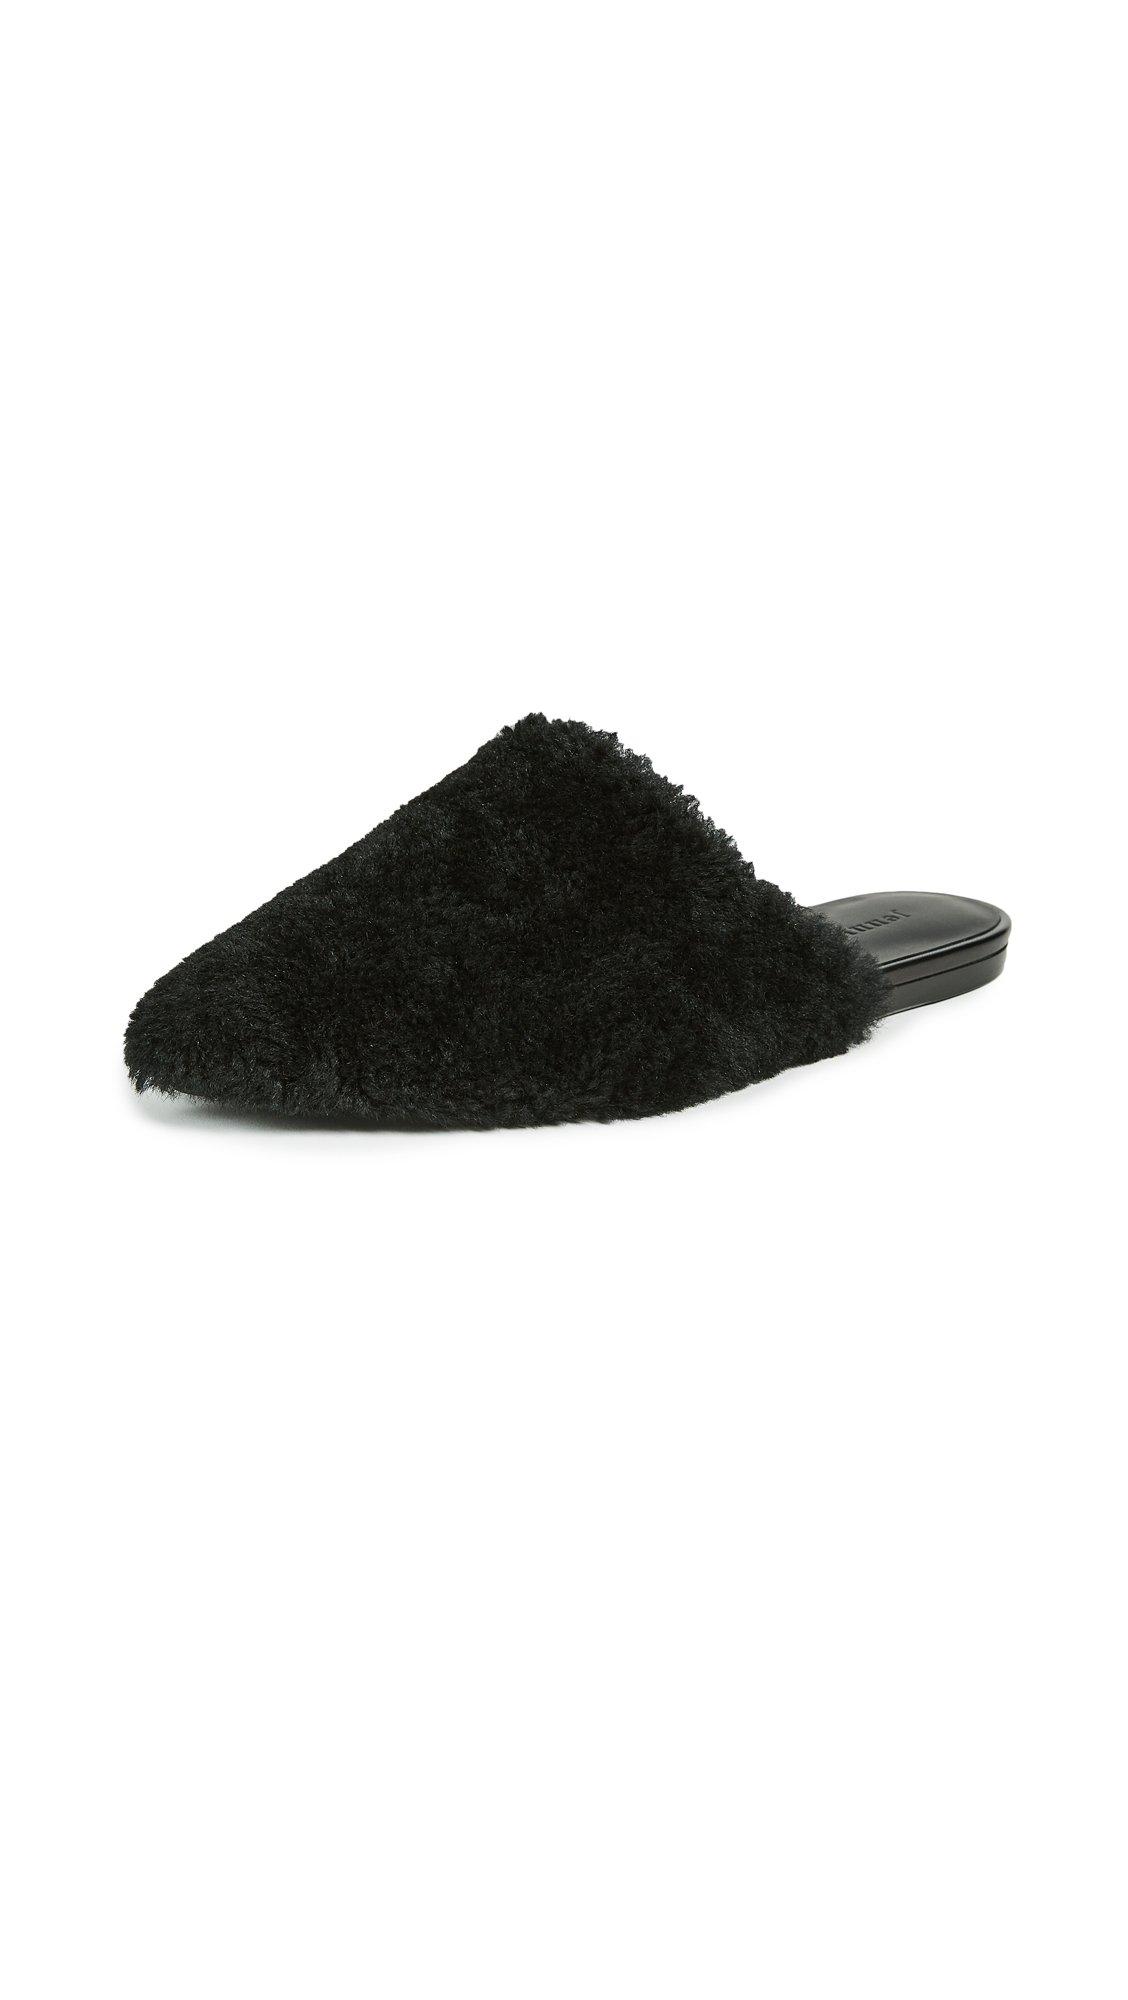 Jenni Kayne Women's Shearling Slippers, Black, 36 EU (6 B(M) US Women)